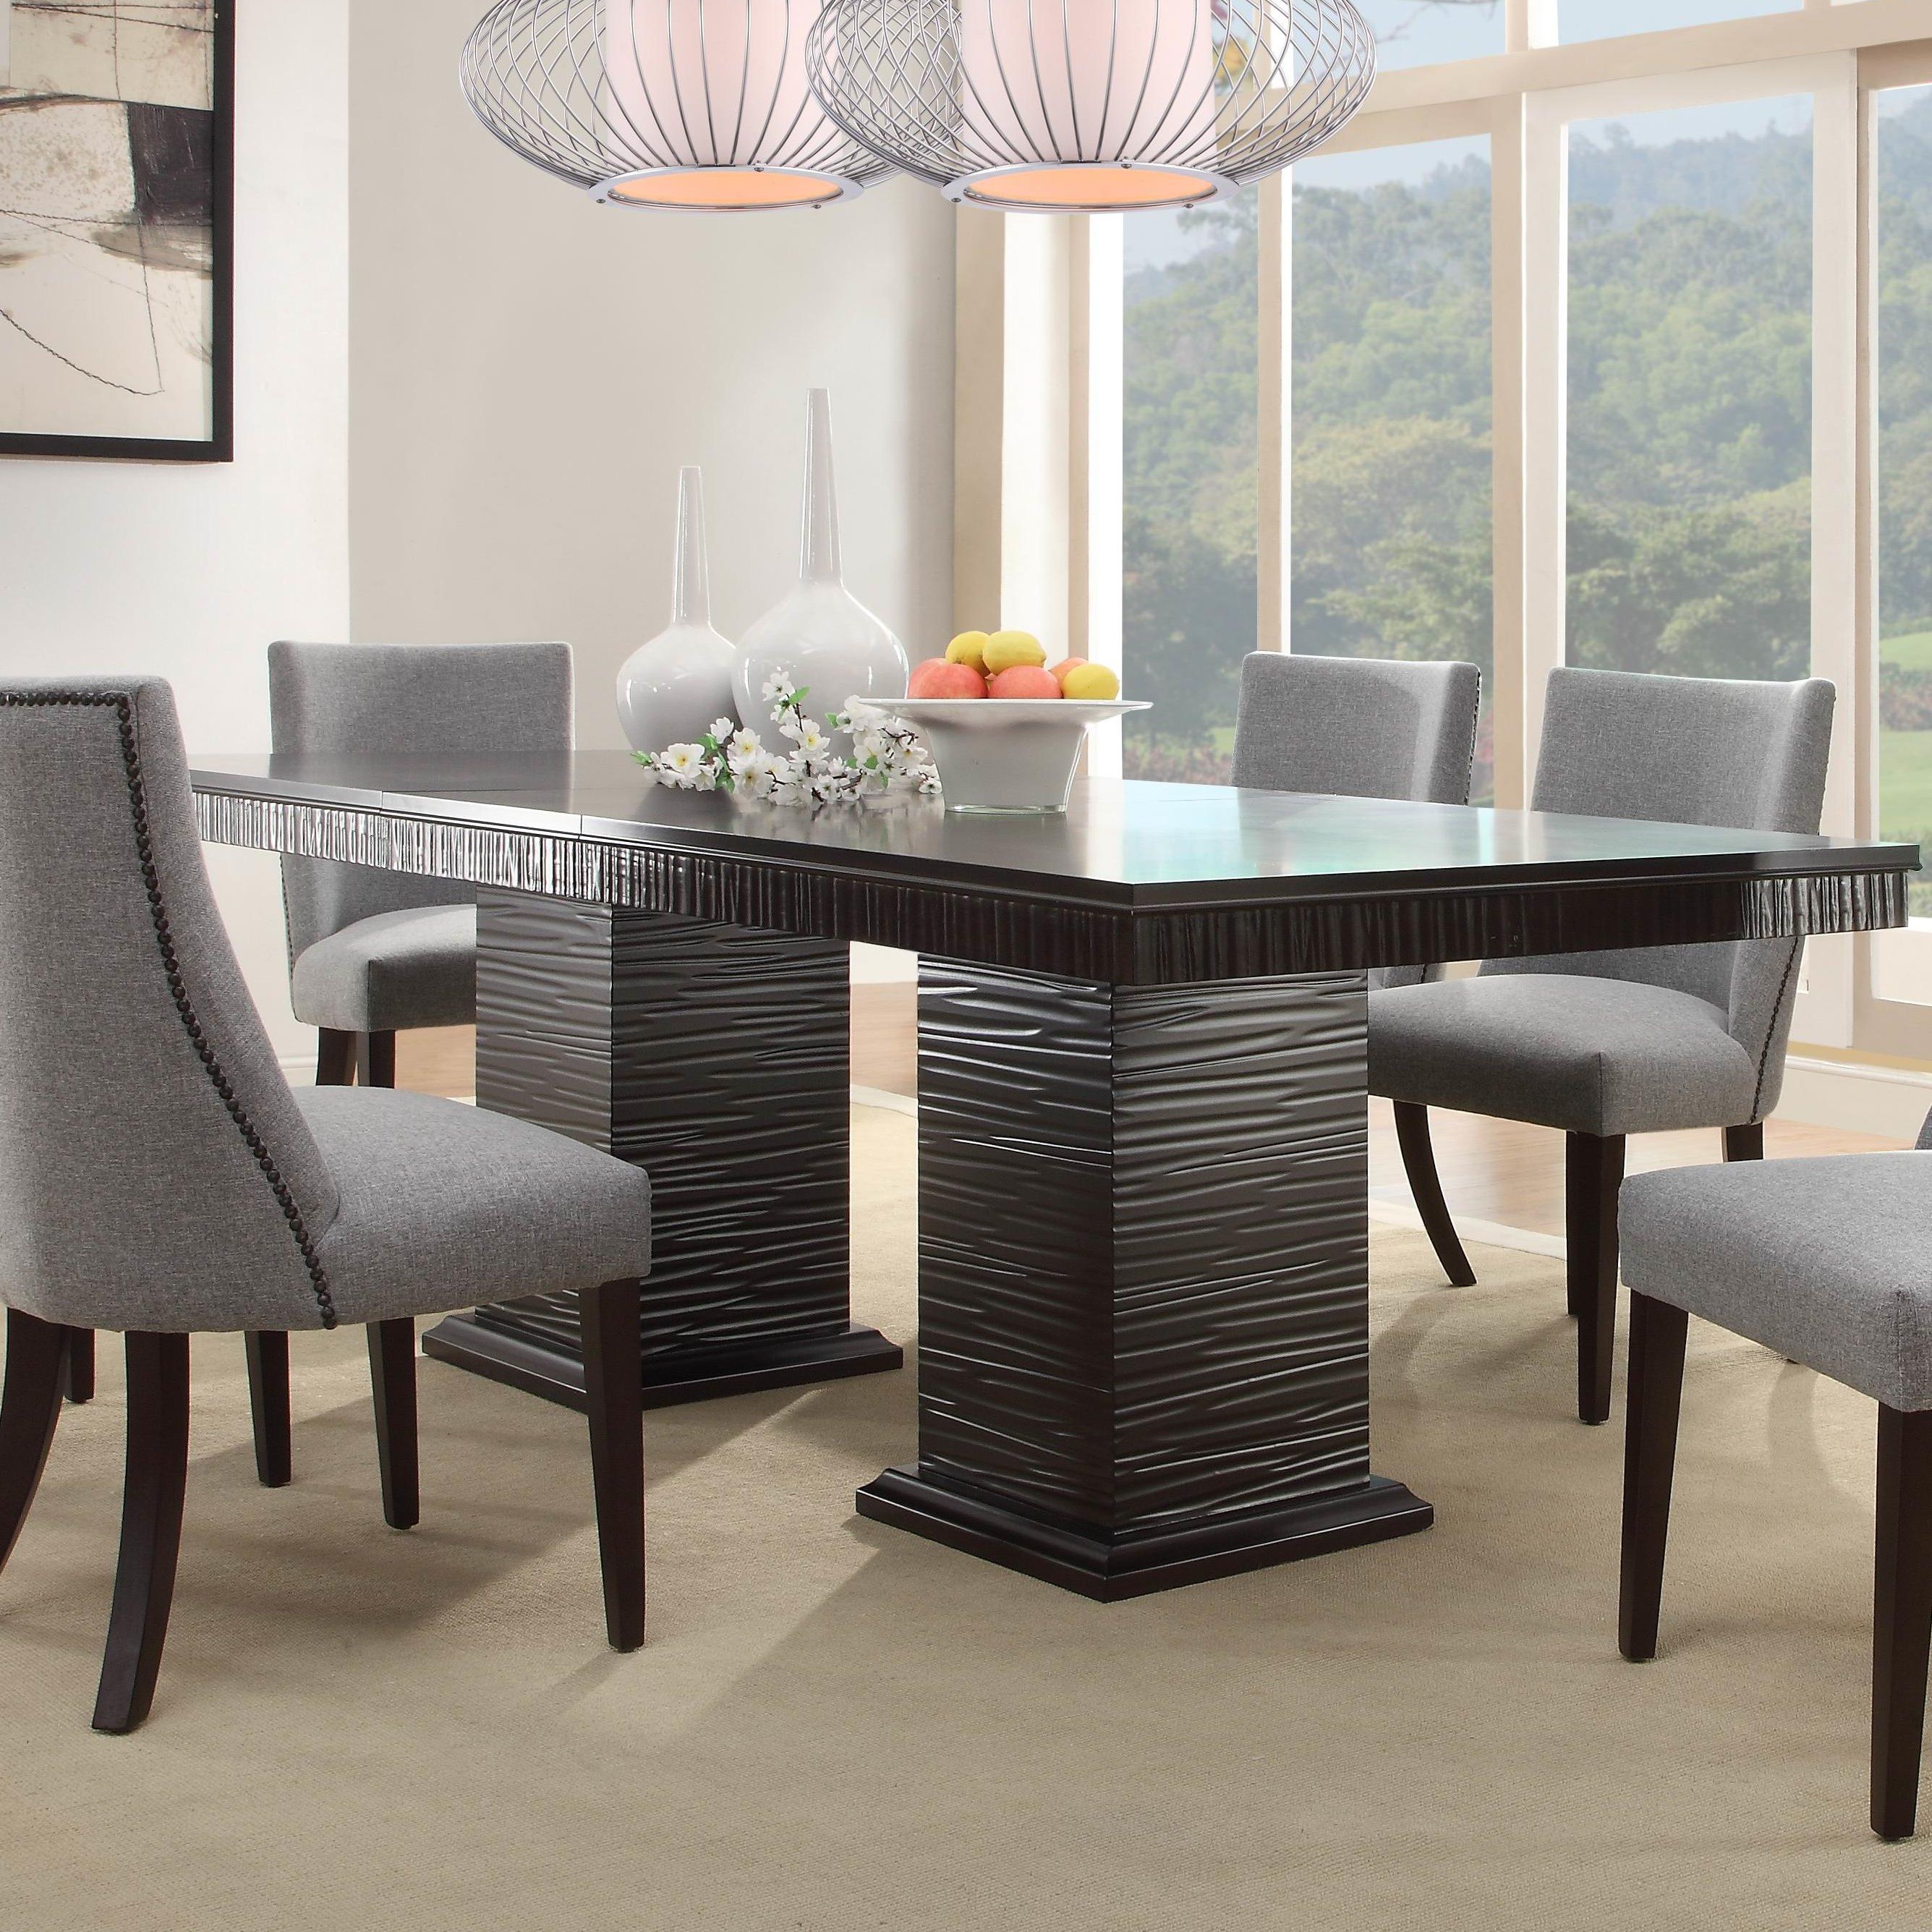 Dining Table Rldj Willa Arlo Interiors Cadogan Extendable Dining Table Reviews Wayfair